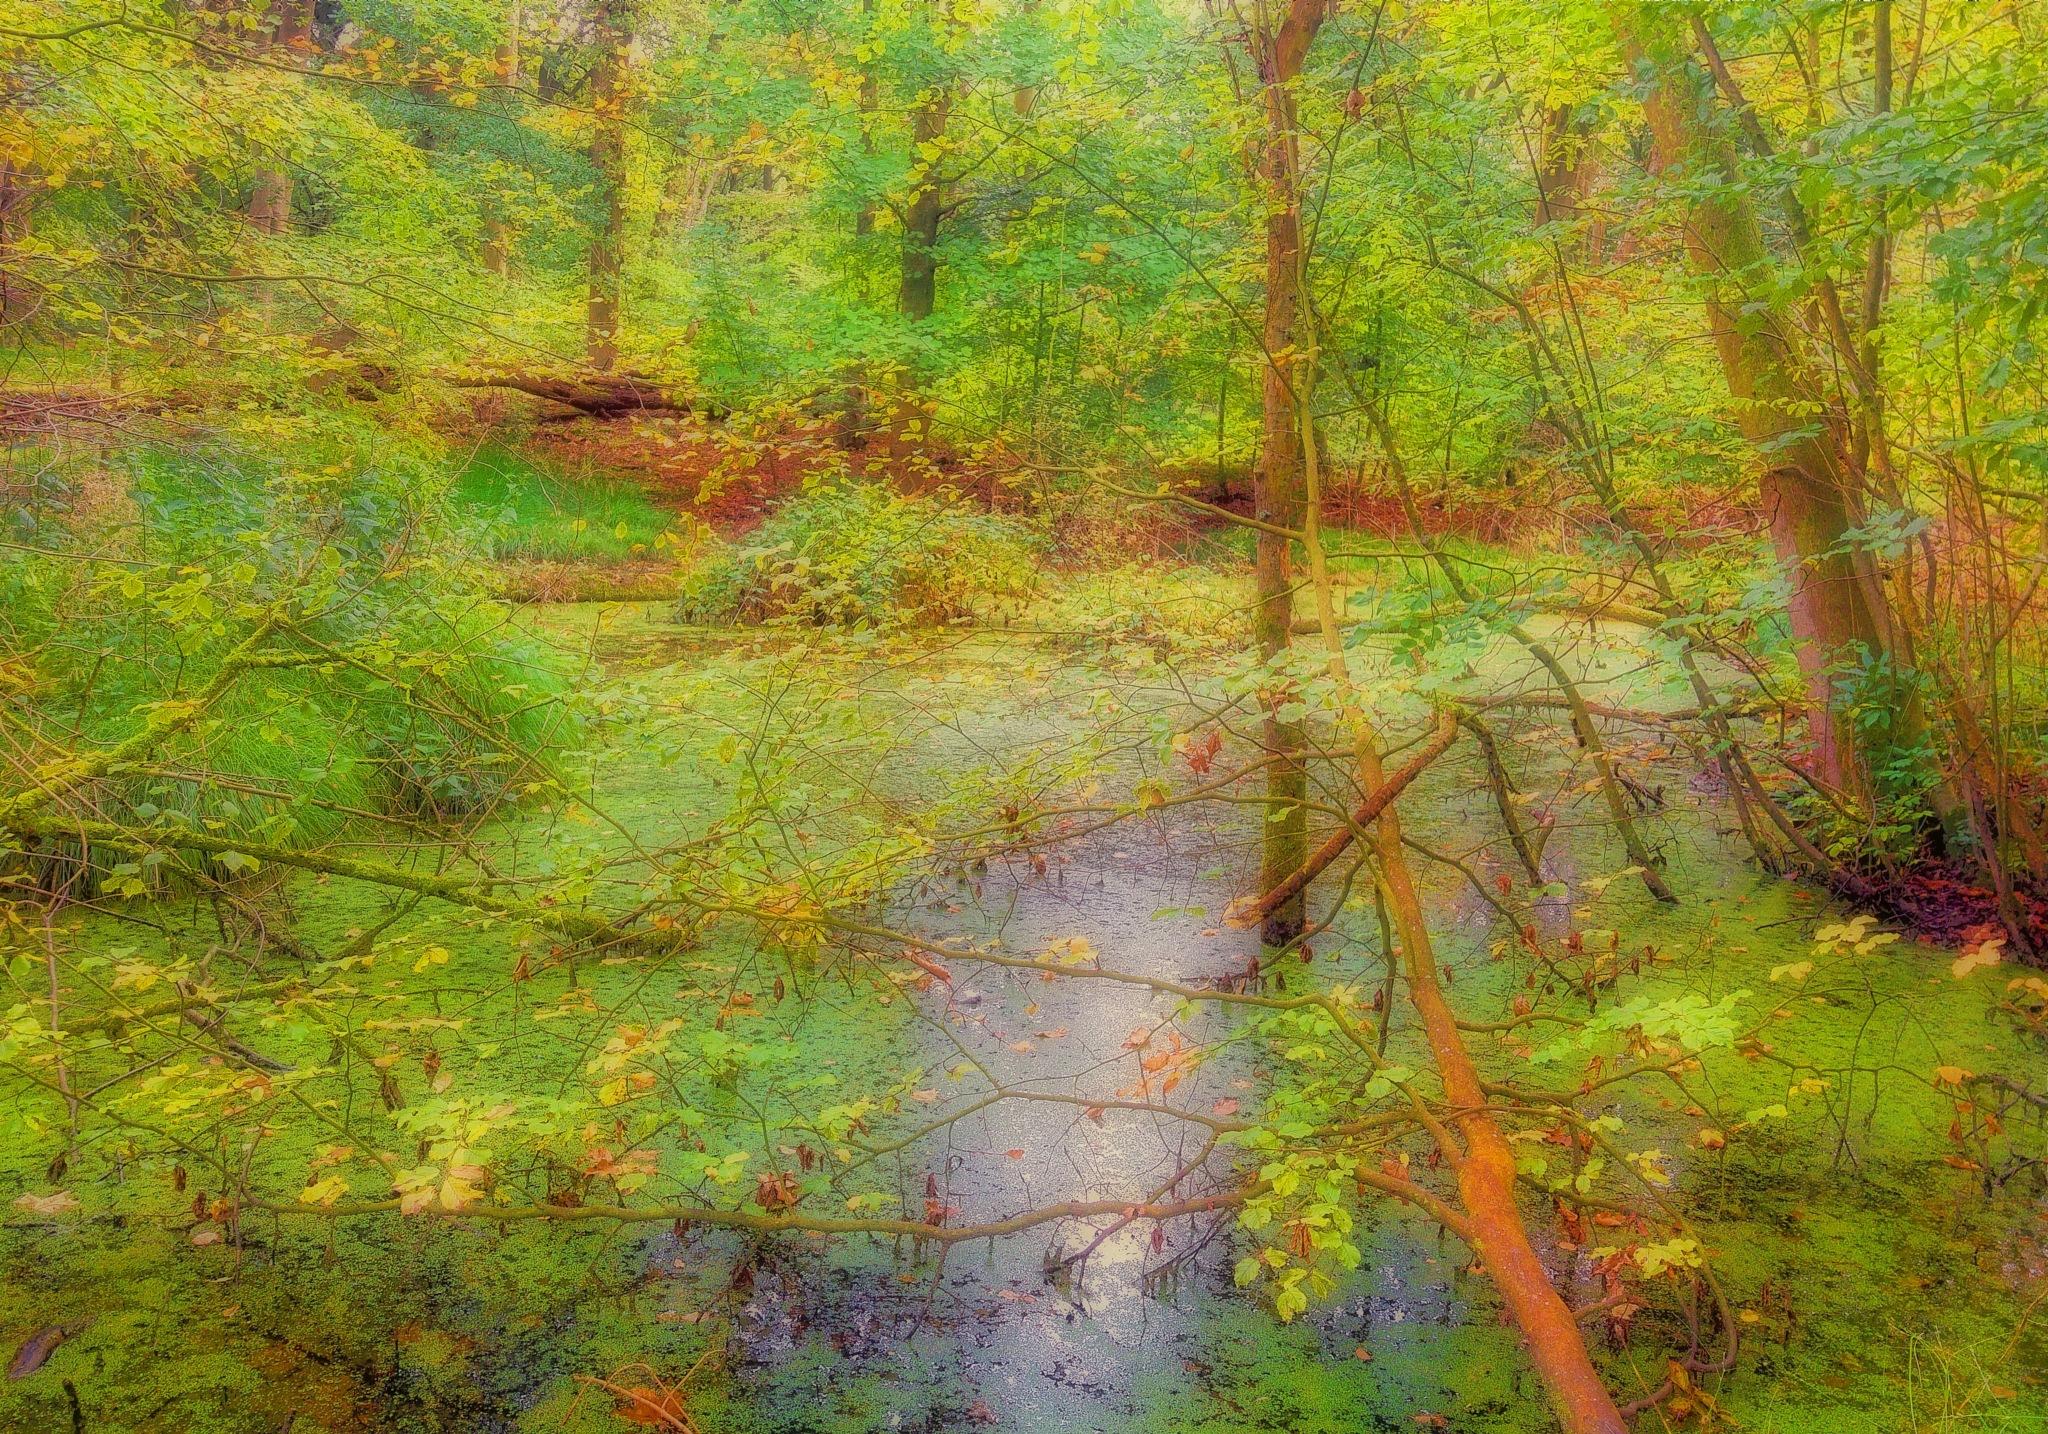 The Autumn Casanova 2 by darronshome